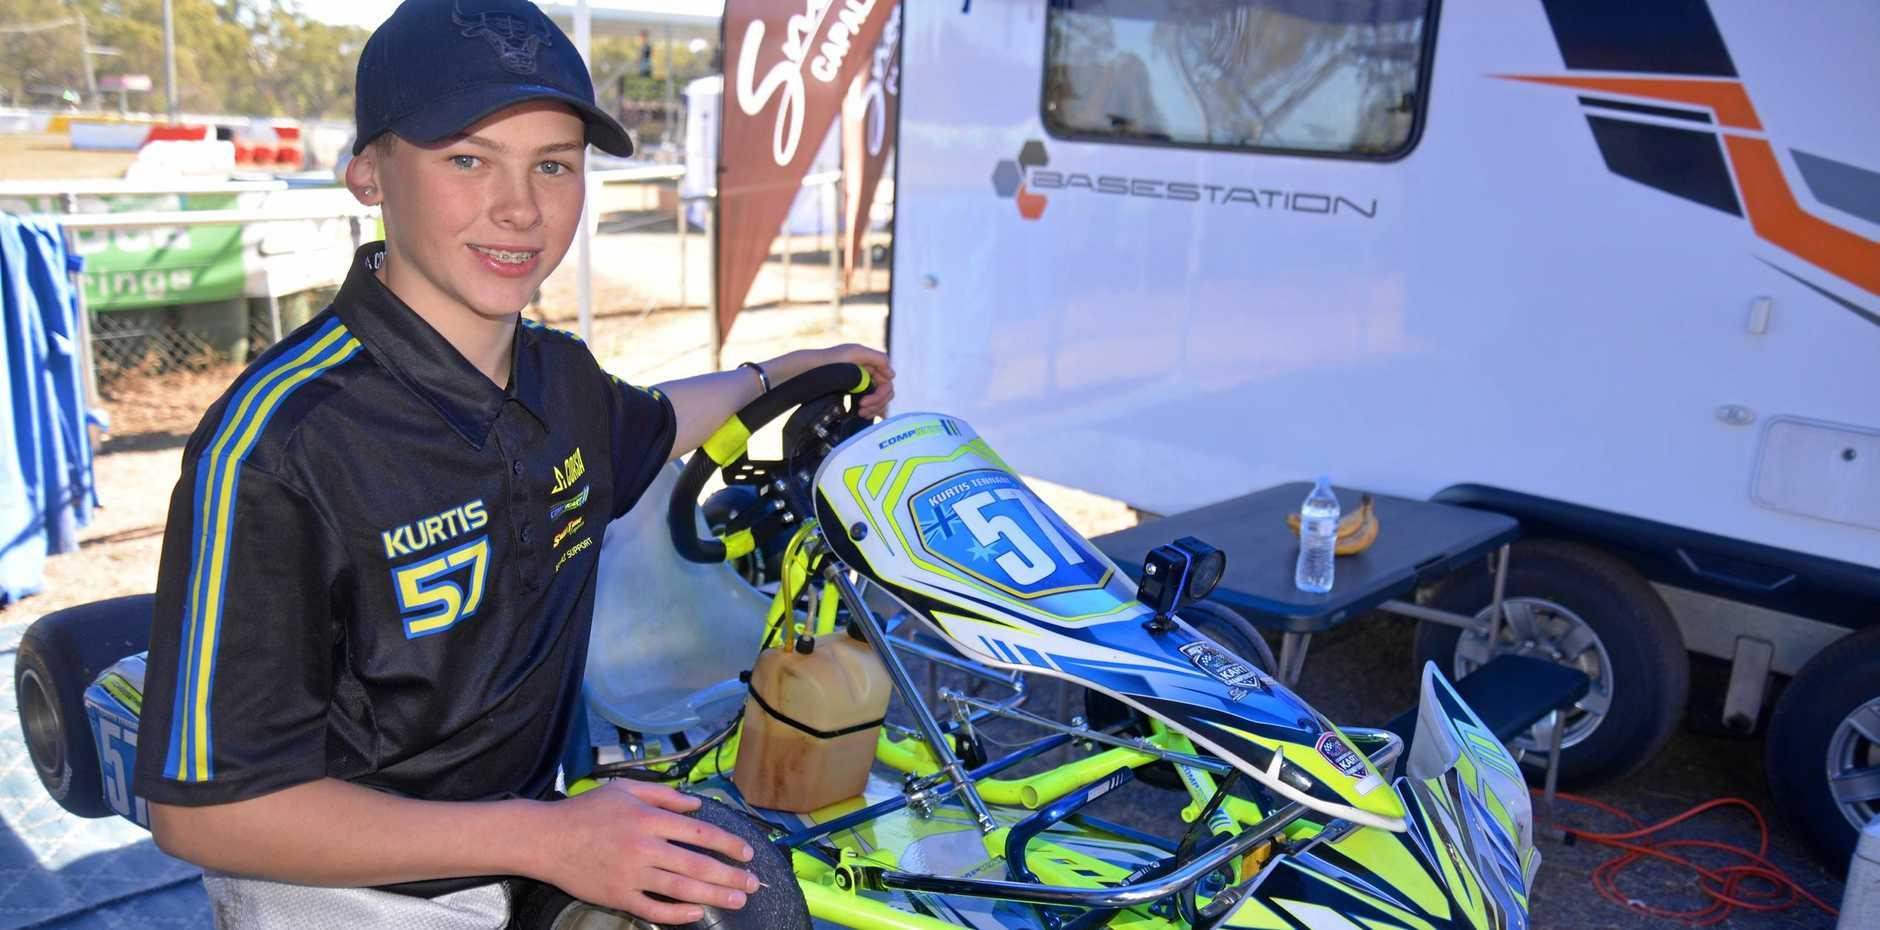 Kurtis Tennant won KA4 junior class at the Queensland Junior Top Guns at Sandy Creek Raceway.